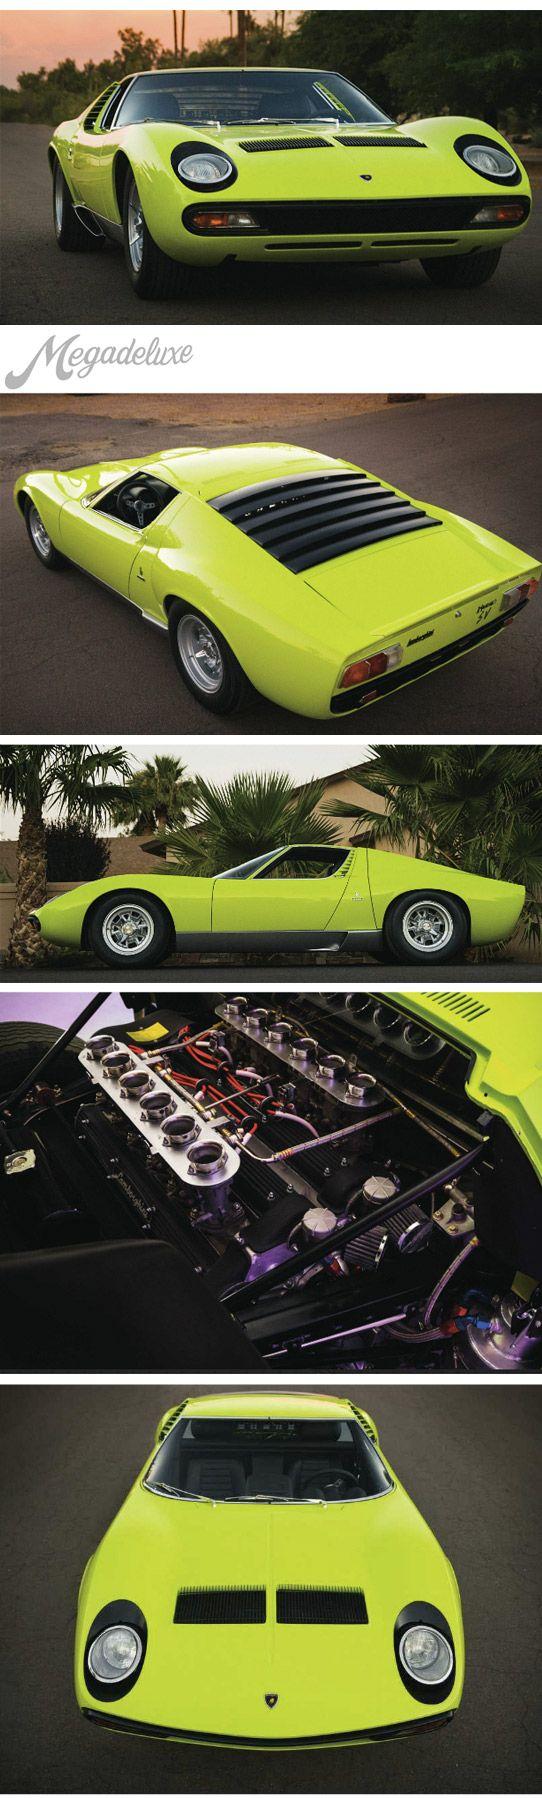 1967 LAMBORGHINI MIURA P400 SV CONVERSION ✏✏✏✏✏✏✏✏✏✏✏✏✏✏✏✏ IDEE CADEAU / CUTE GIFT IDEA  ☞ http://gabyfeeriefr.tumblr.com/archive ✏✏✏✏✏✏✏✏✏✏✏✏✏✏✏✏